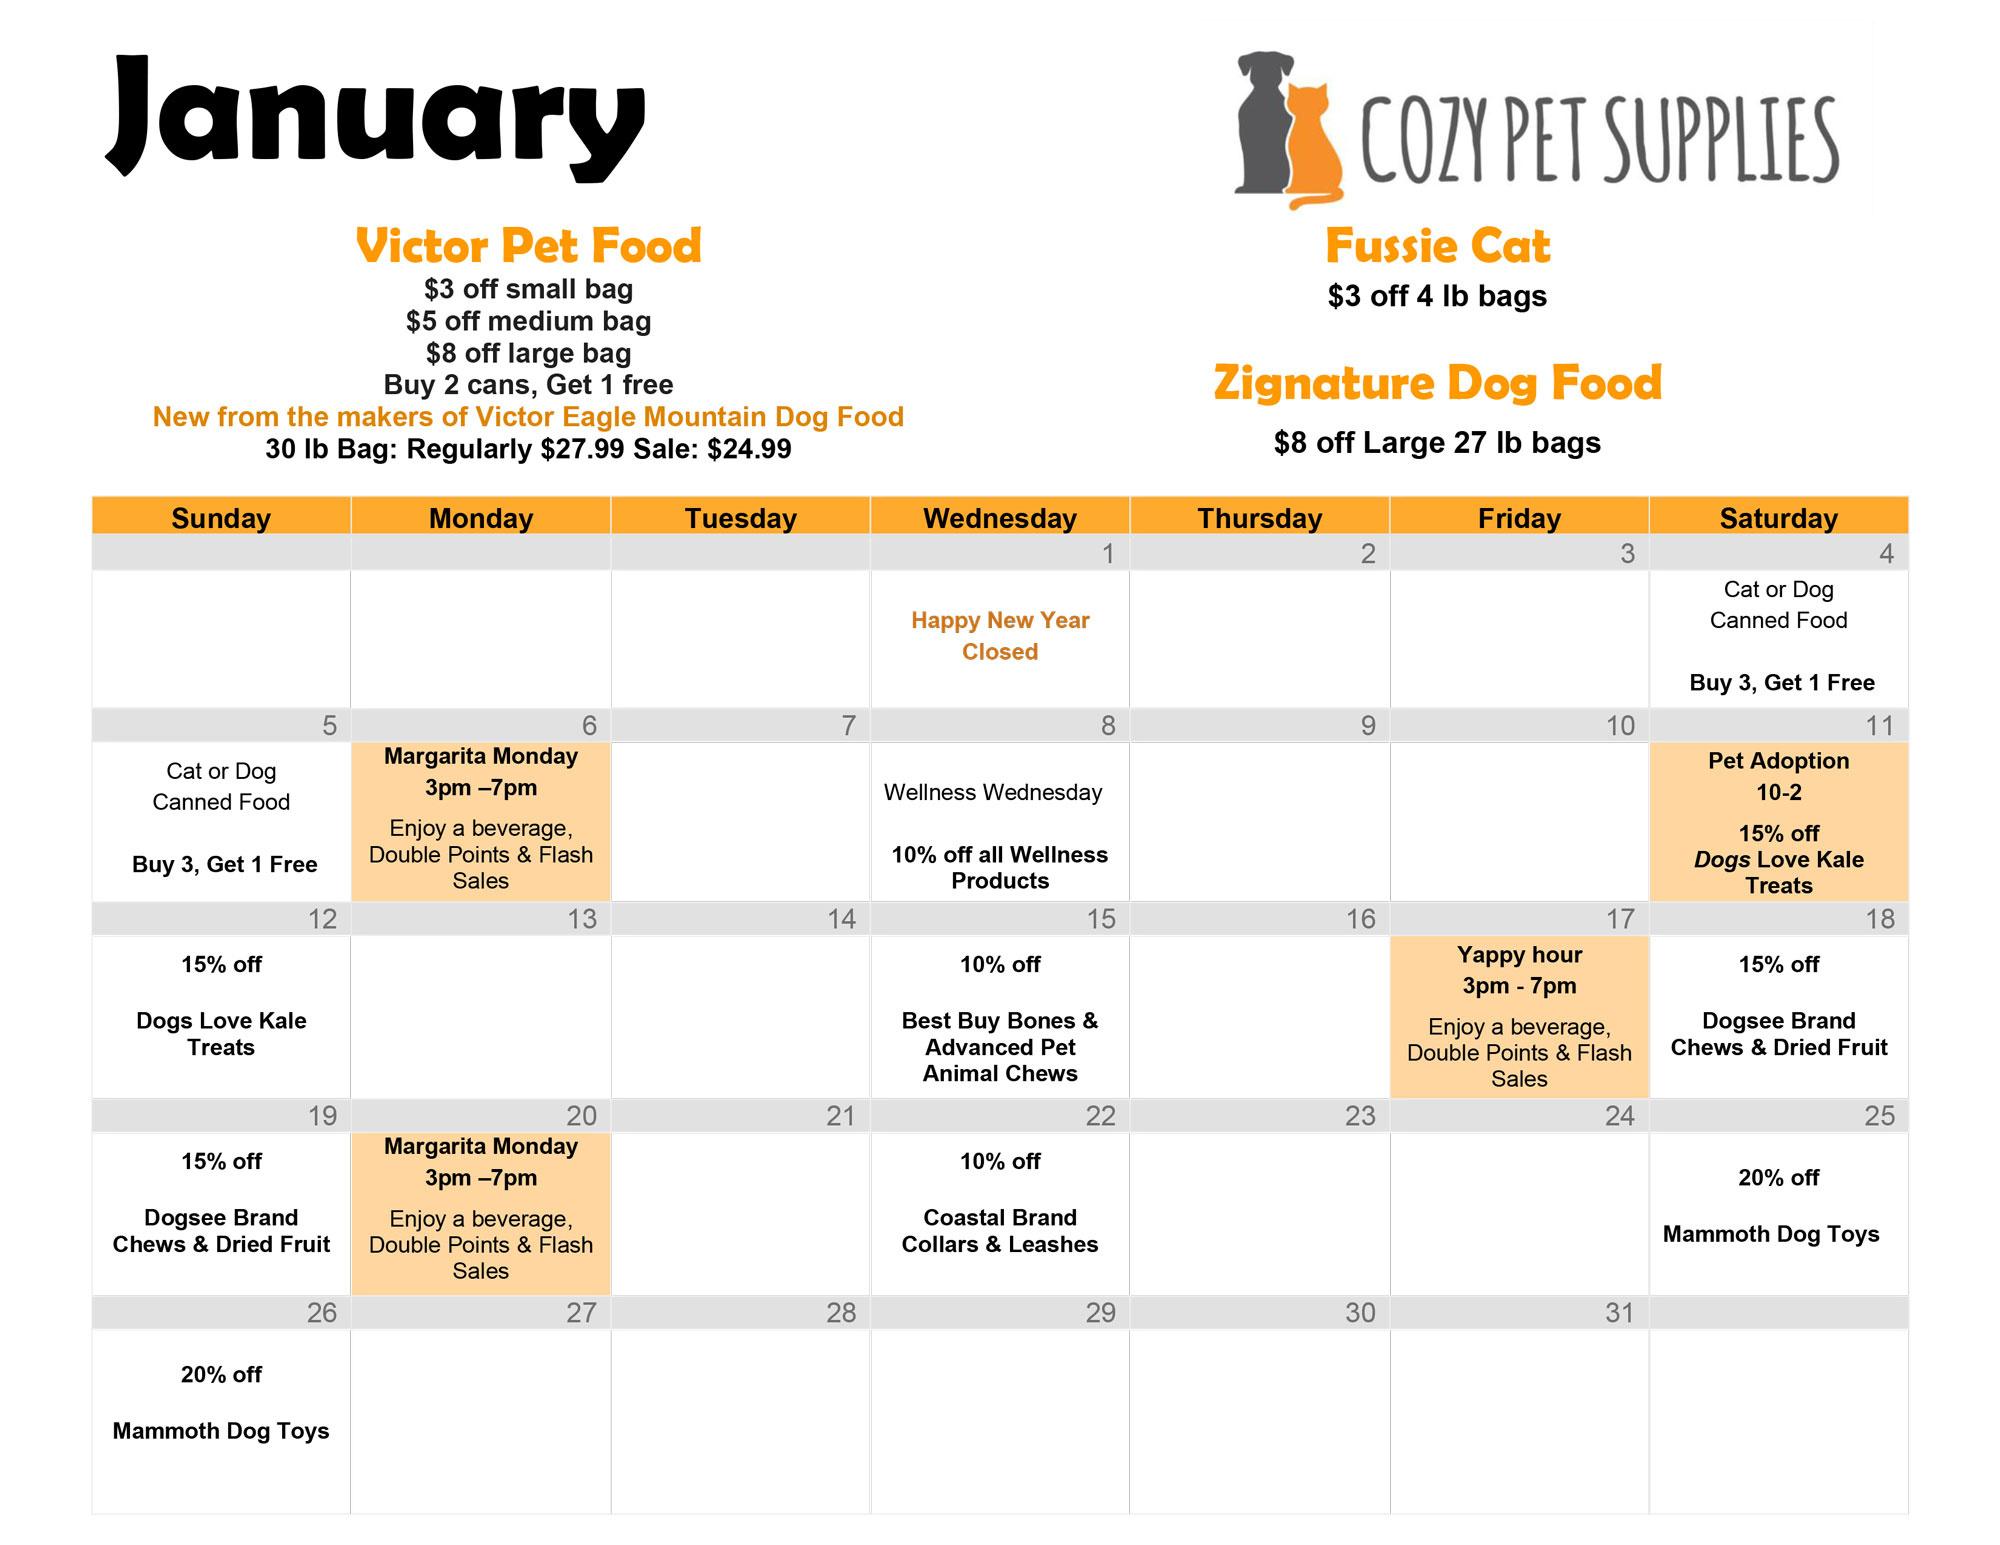 Cozy Pet Supplies Calendar - January 2020